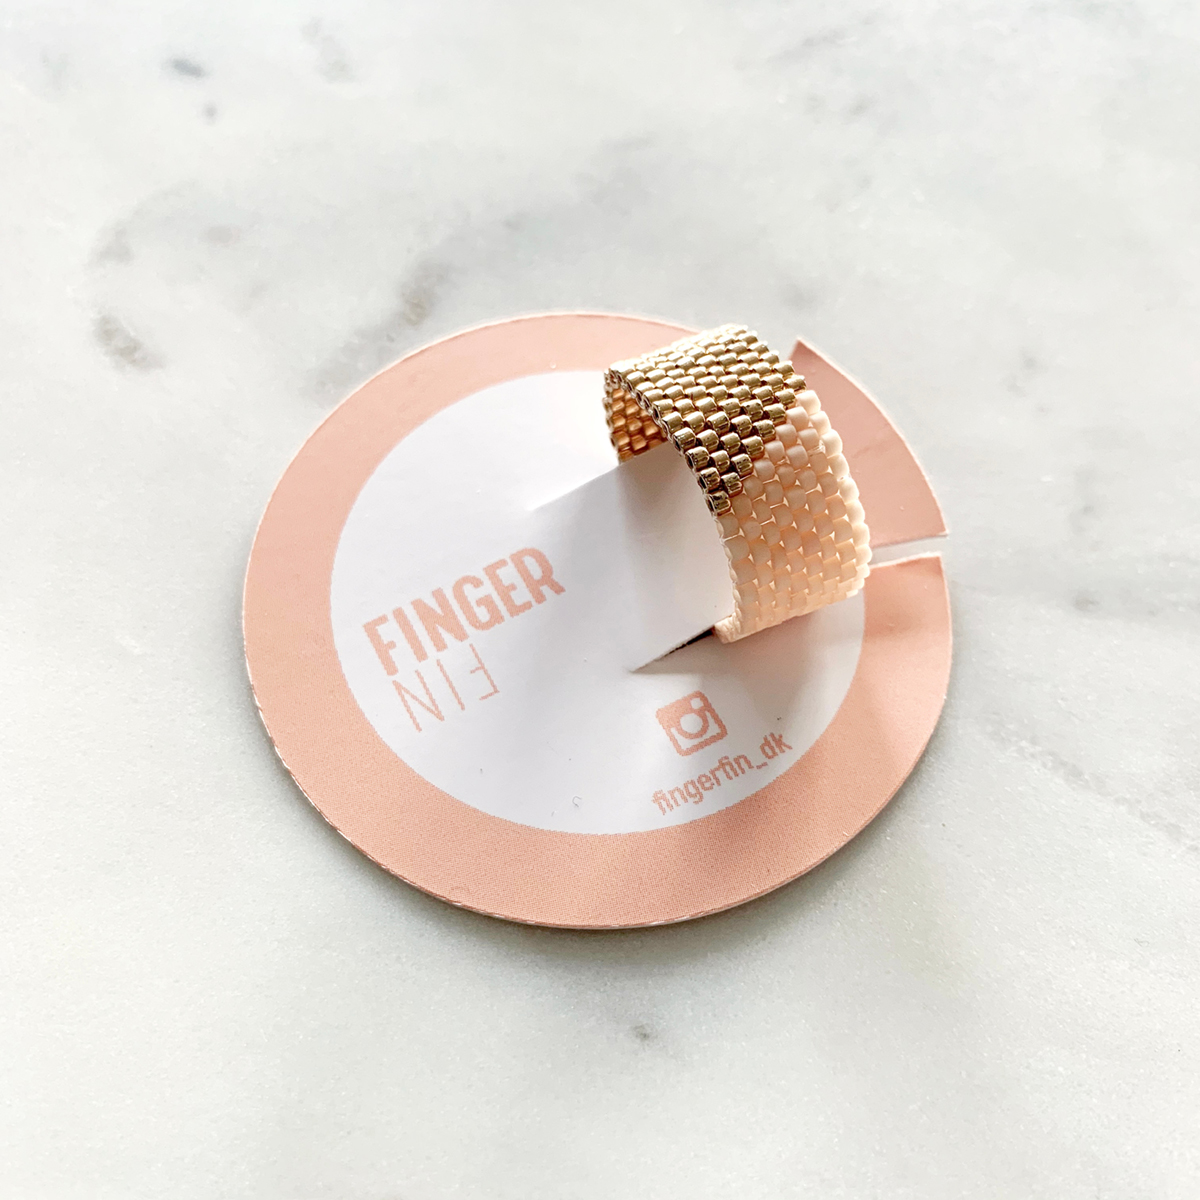 FingerFin logo